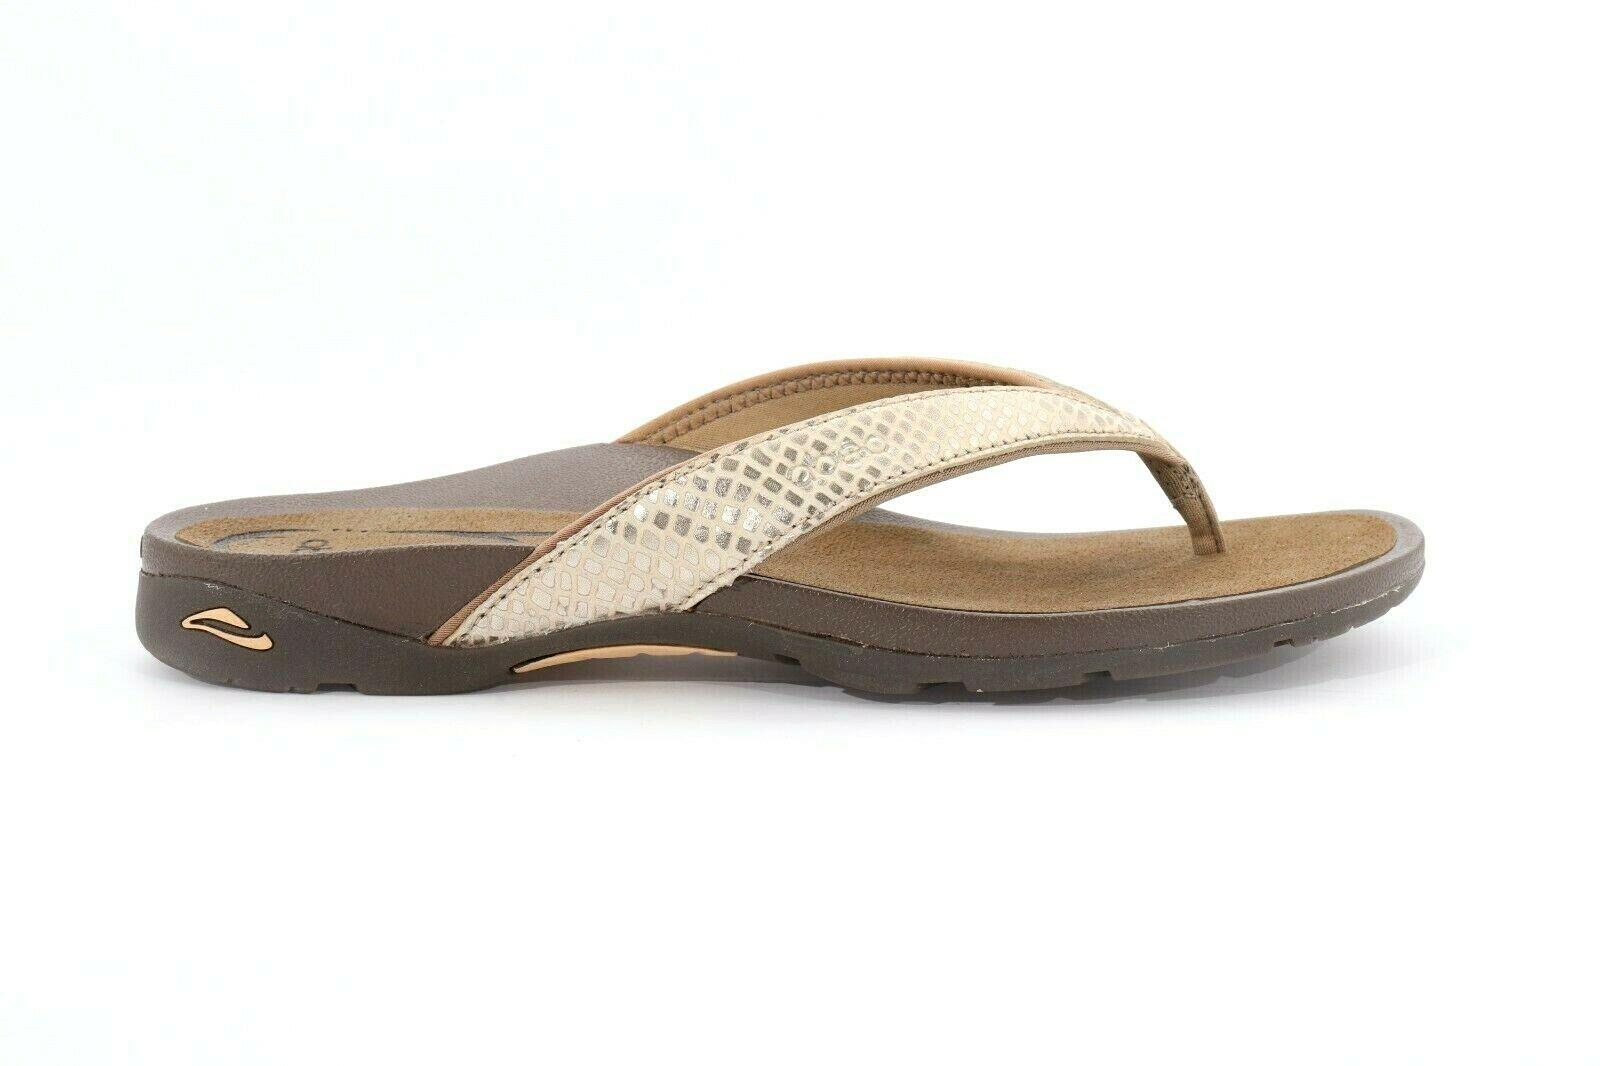 Abeo Alea Slides Gold Women's Size US 7  Neutral Footbed ( ) - $112.86